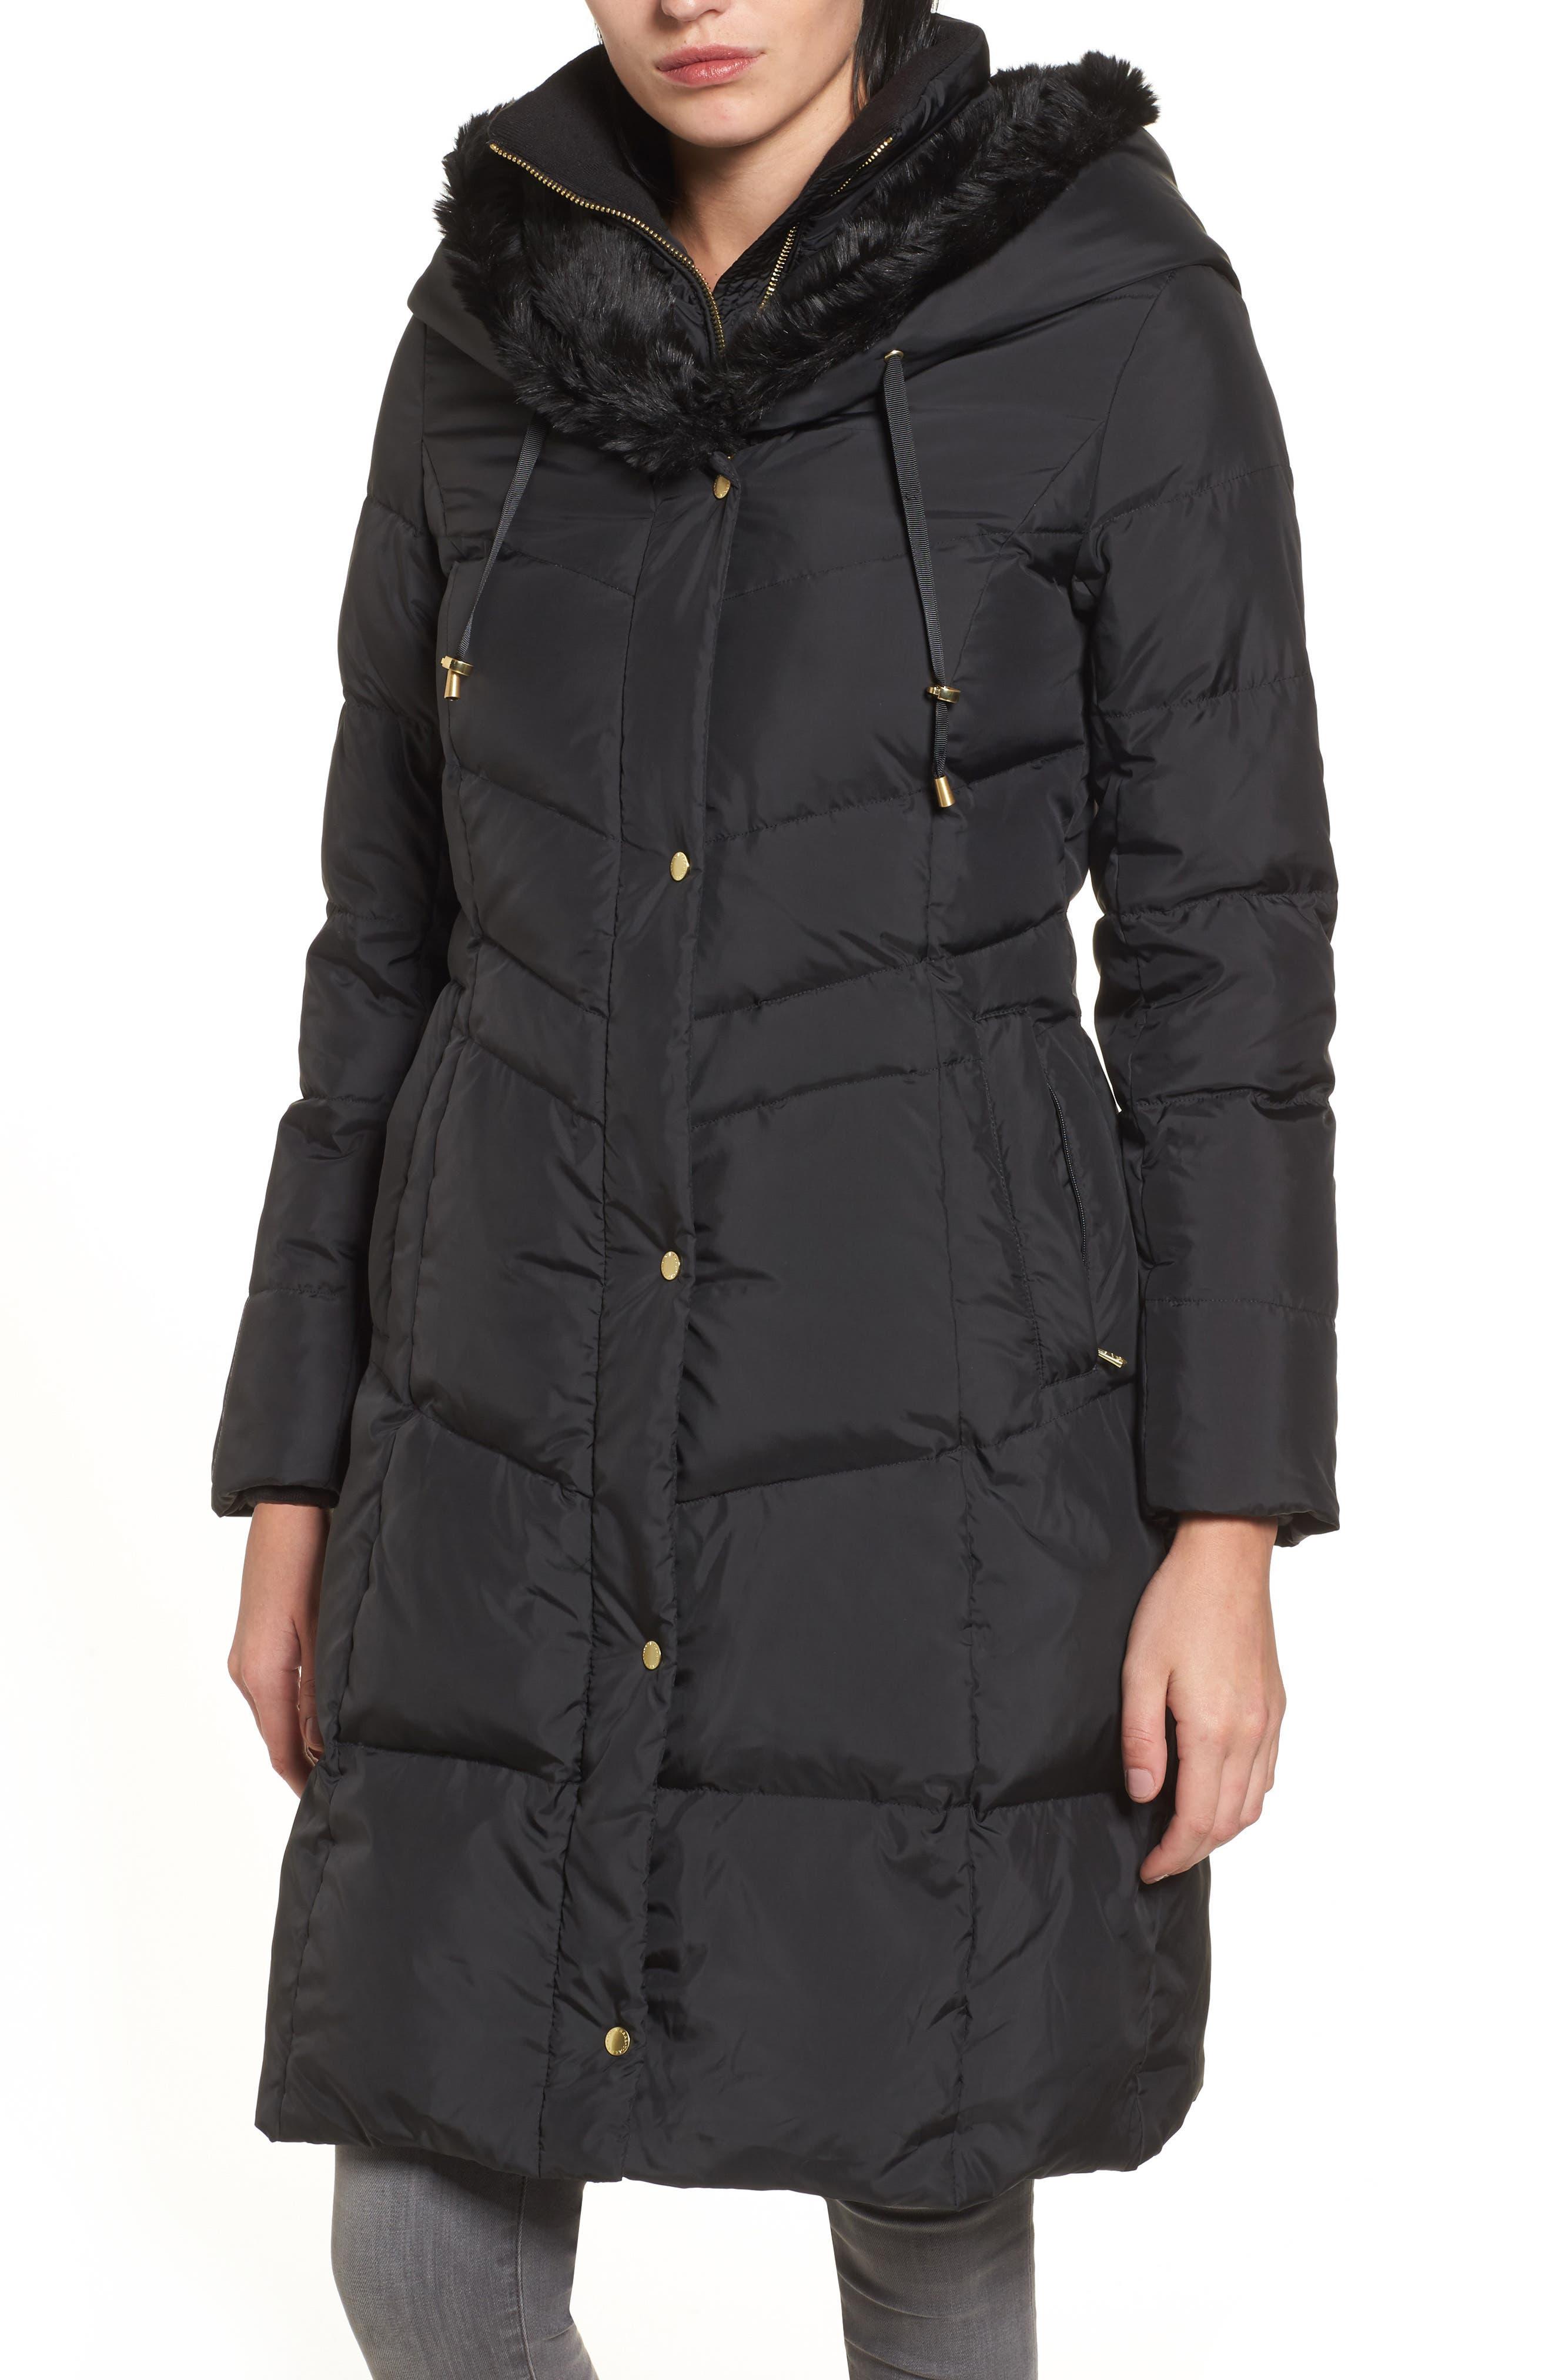 3/4 Down Coat with Faux Fur Hood,                             Main thumbnail 1, color,                             001